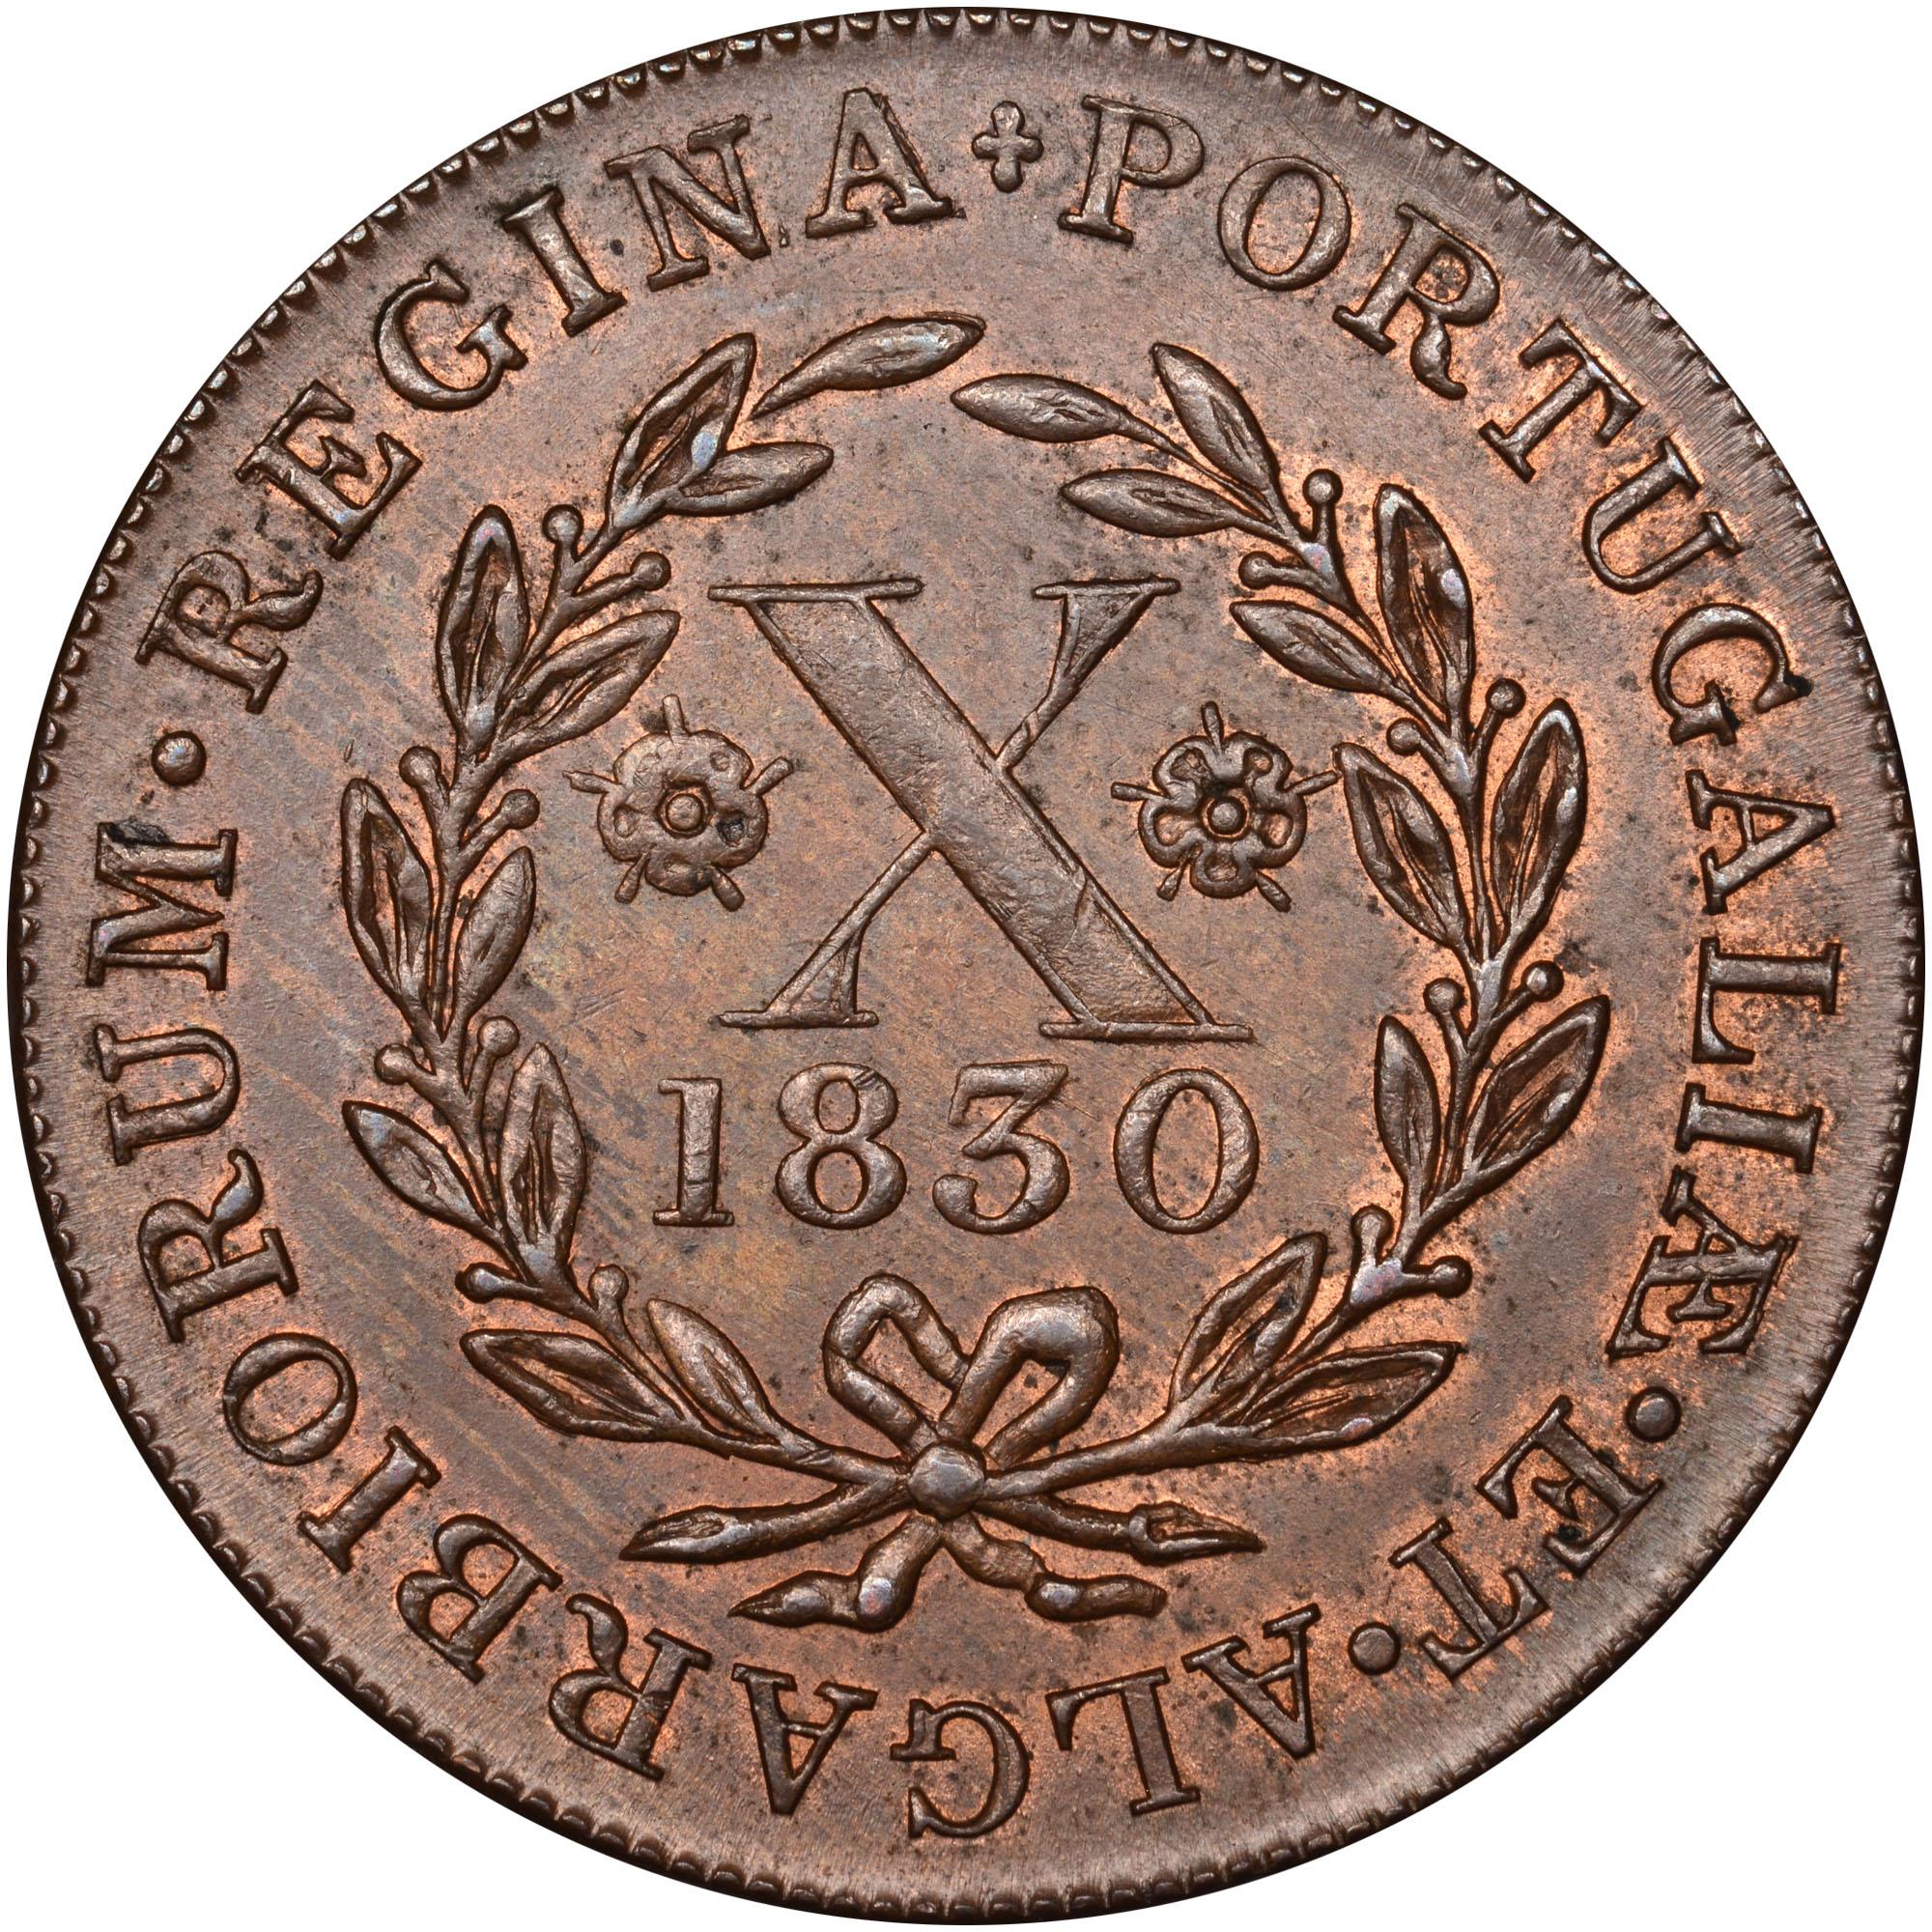 1830 Azores TERCEIRA ISLAND 10 Reis reverse